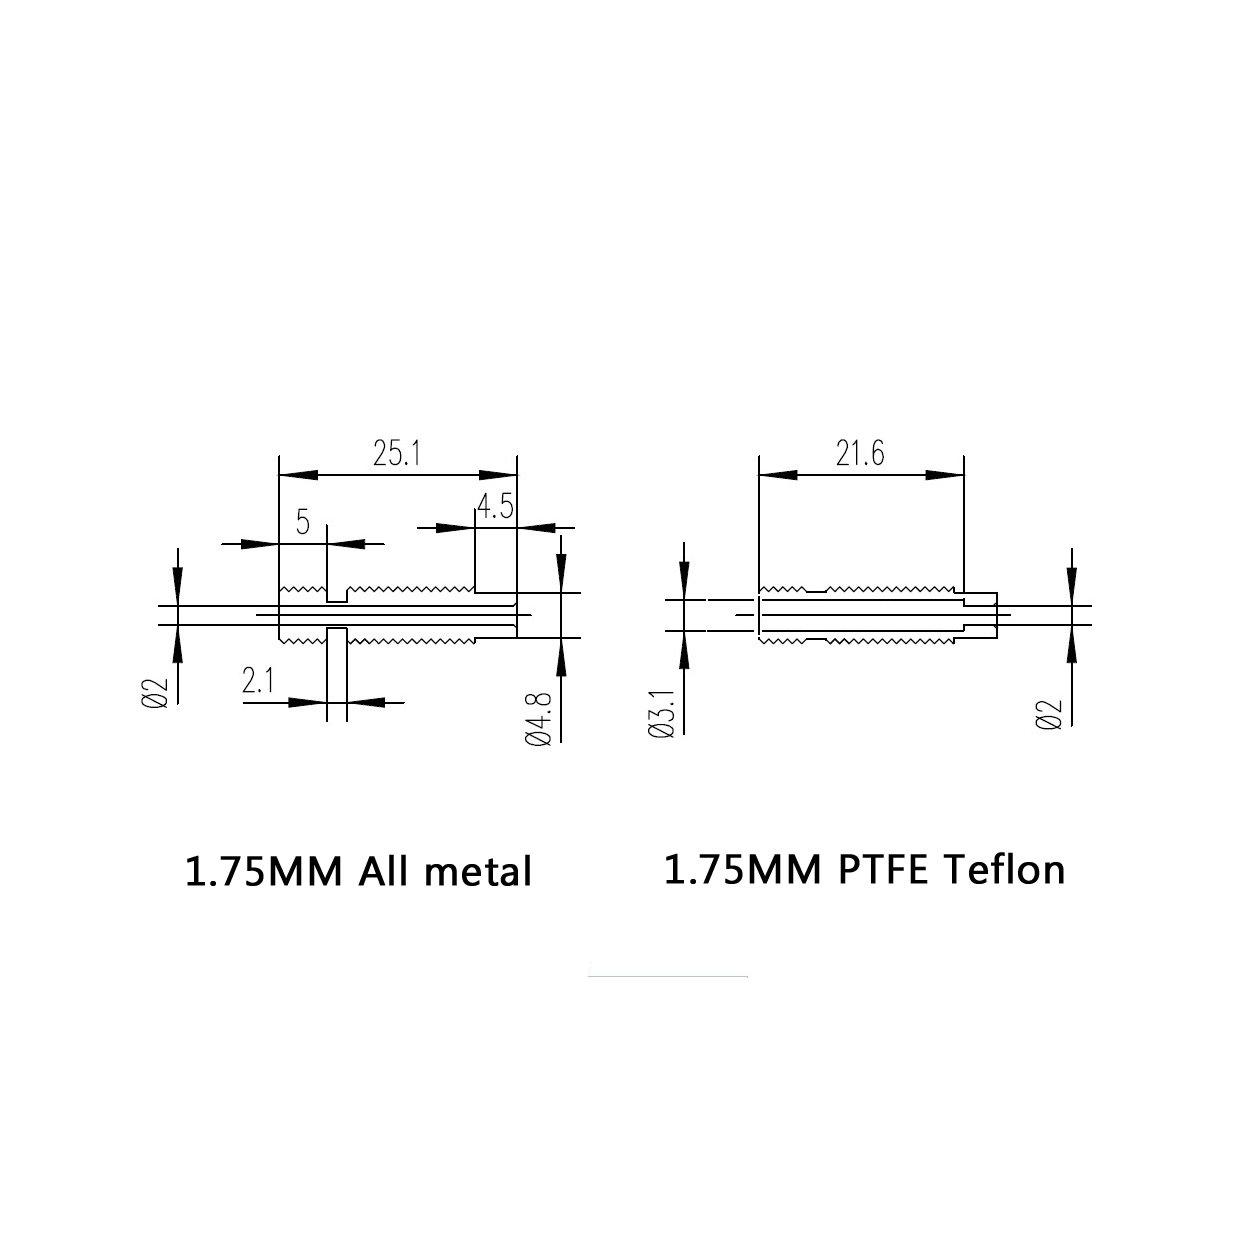 Pack of 5Pcs WINSINN V5 V6 Heatbreak Short Titanium All Metal Heat Break 1.75mm Throat M6 for 3D Printer Extruder Hotend Volcano WINSINN Technology Ltd